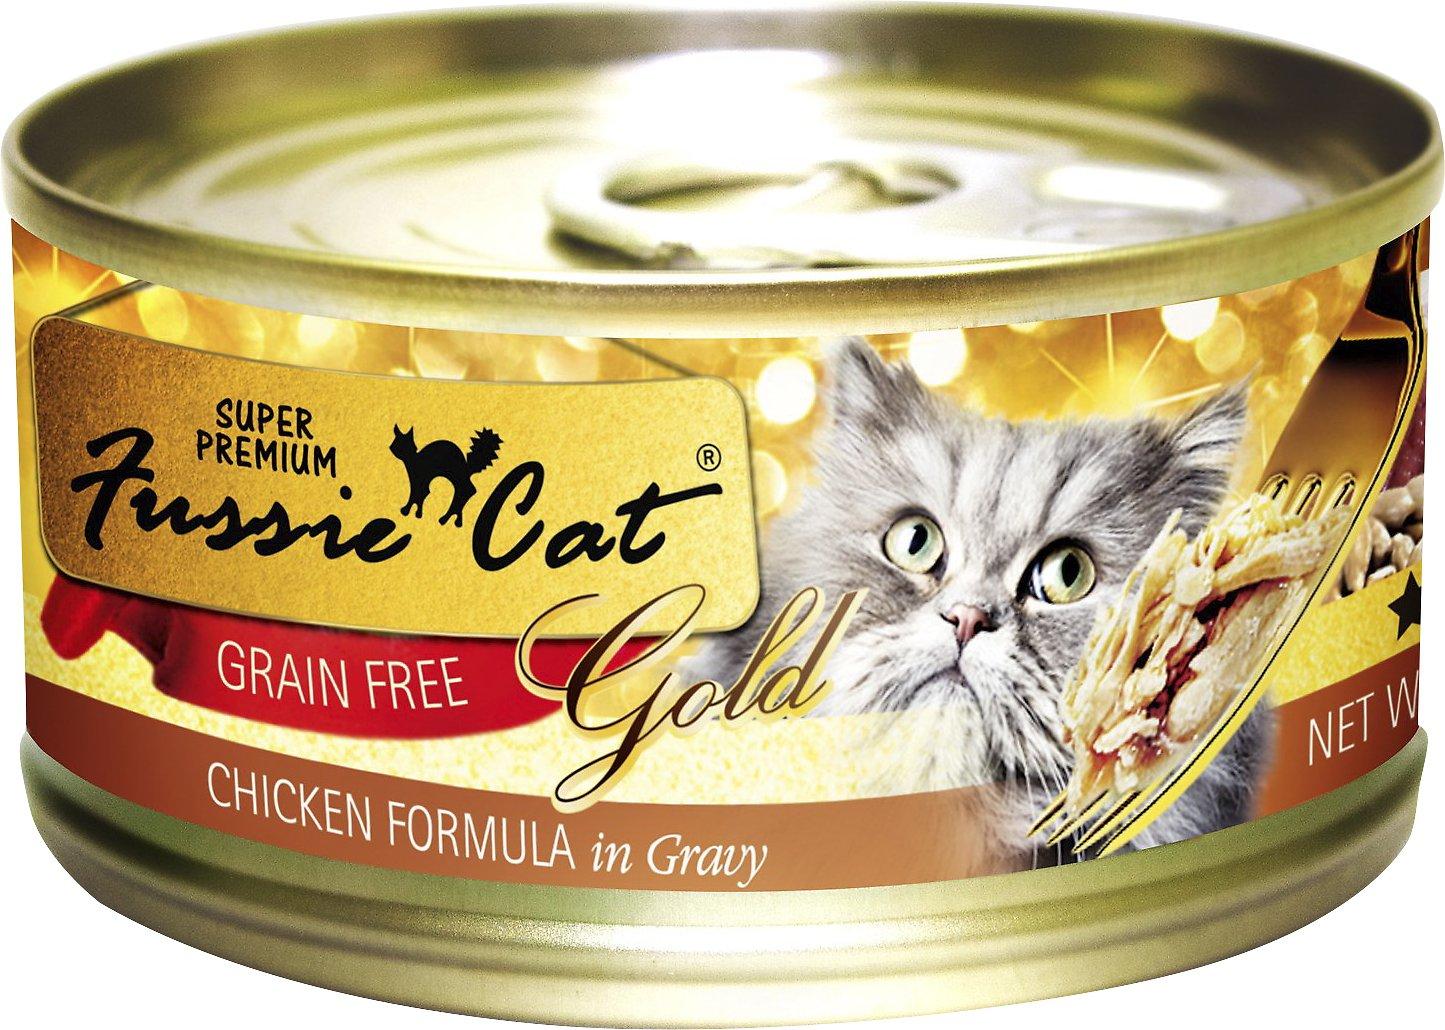 Fussie Cat Super Premium Chicken Formula in Gravy Grain-Free Canned Cat Food, 2.82-oz